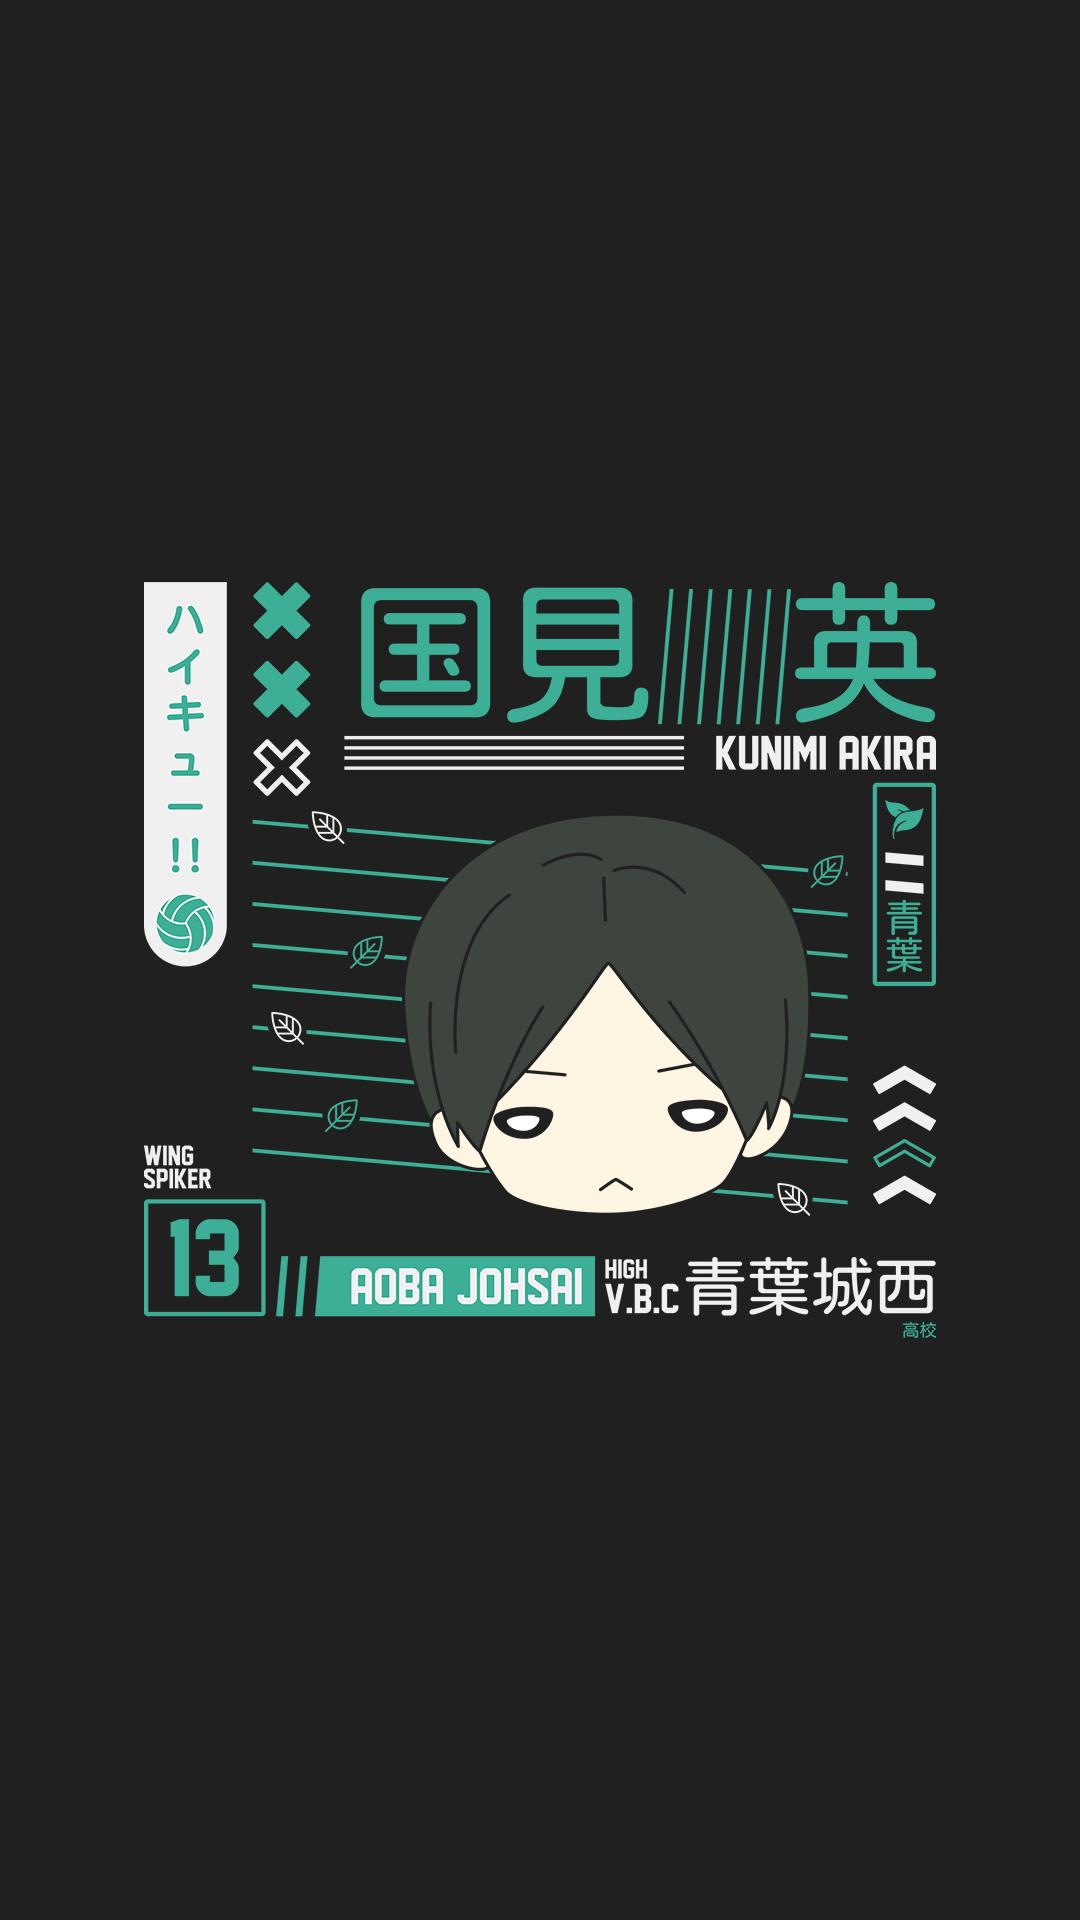 Kunimi Akira Wallpaper Aoba Johsai In 2020 Haikyuu Wallpaper Haikyuu Anime Cute Anime Wallpaper